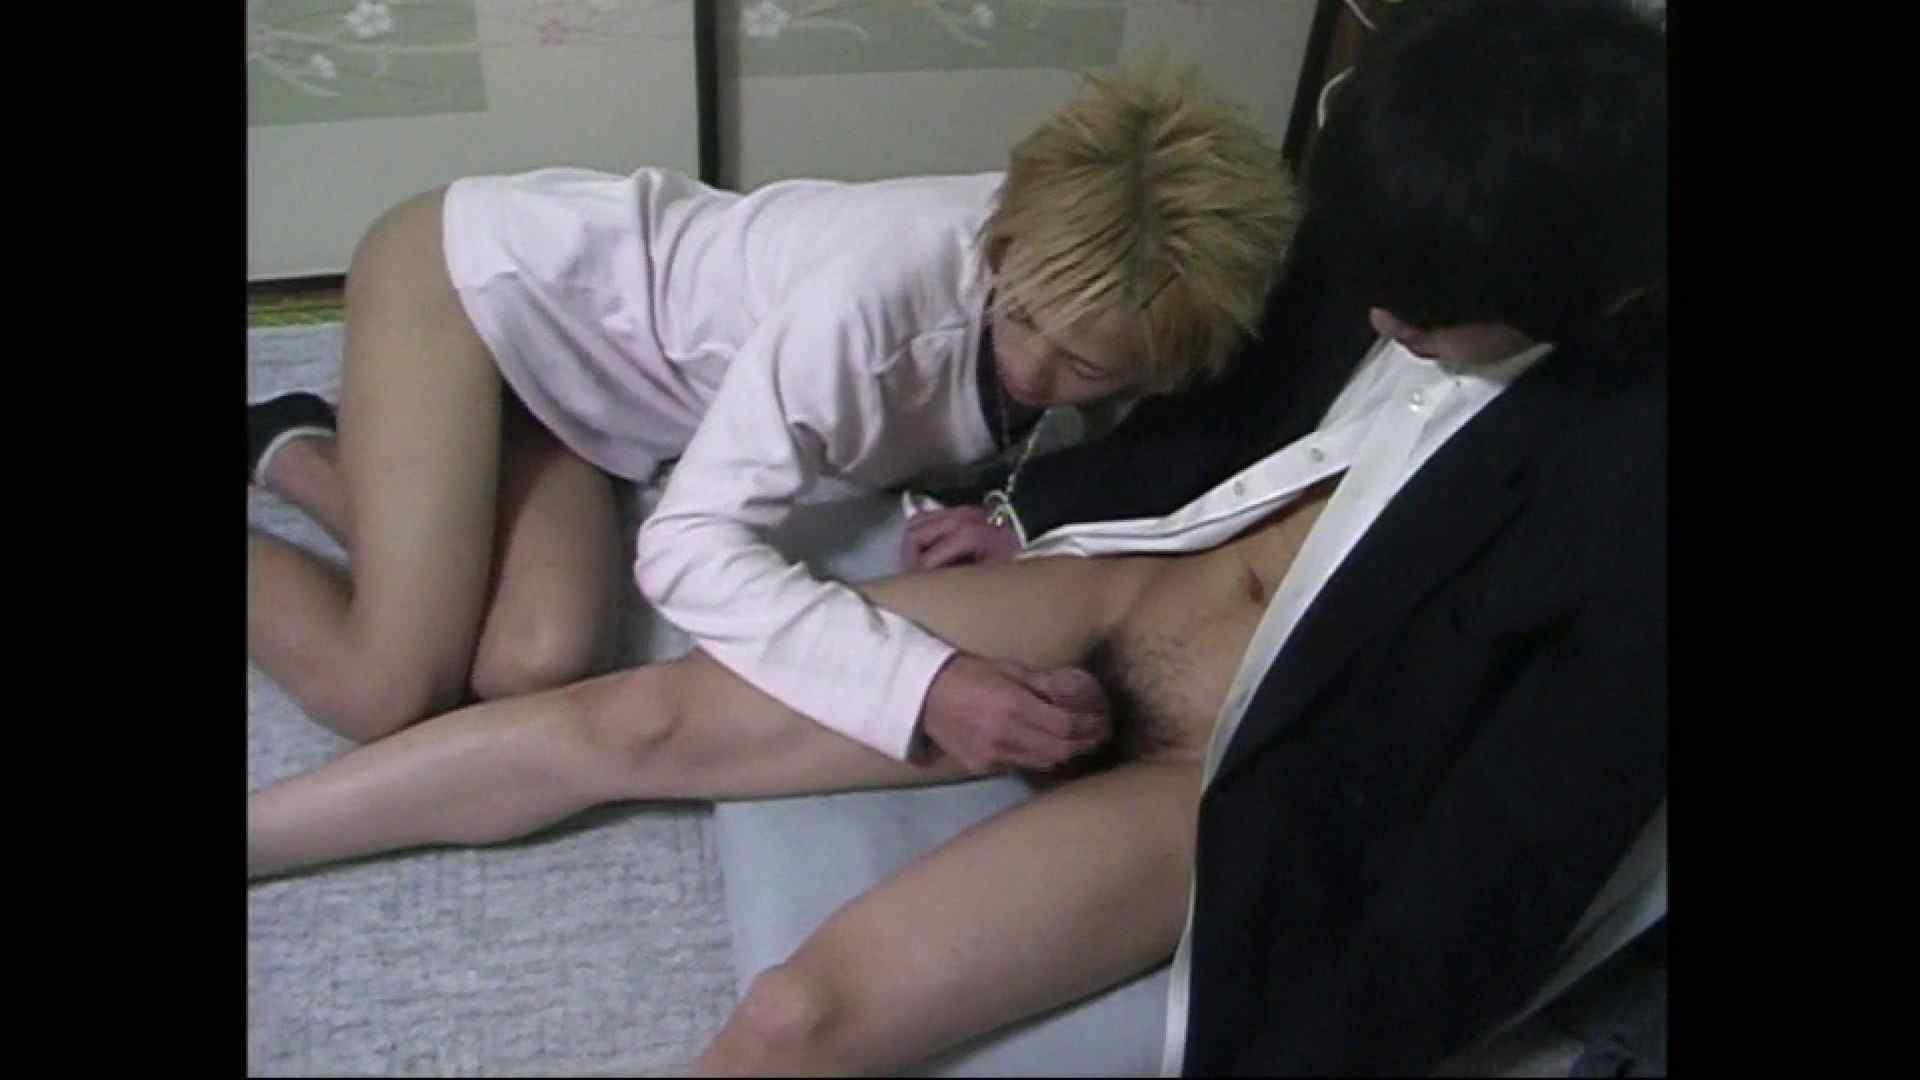 GAYBOY宏のオカズ倉庫Vol.7-1 ゲイのペニス Guyエロ画像 72枚 34